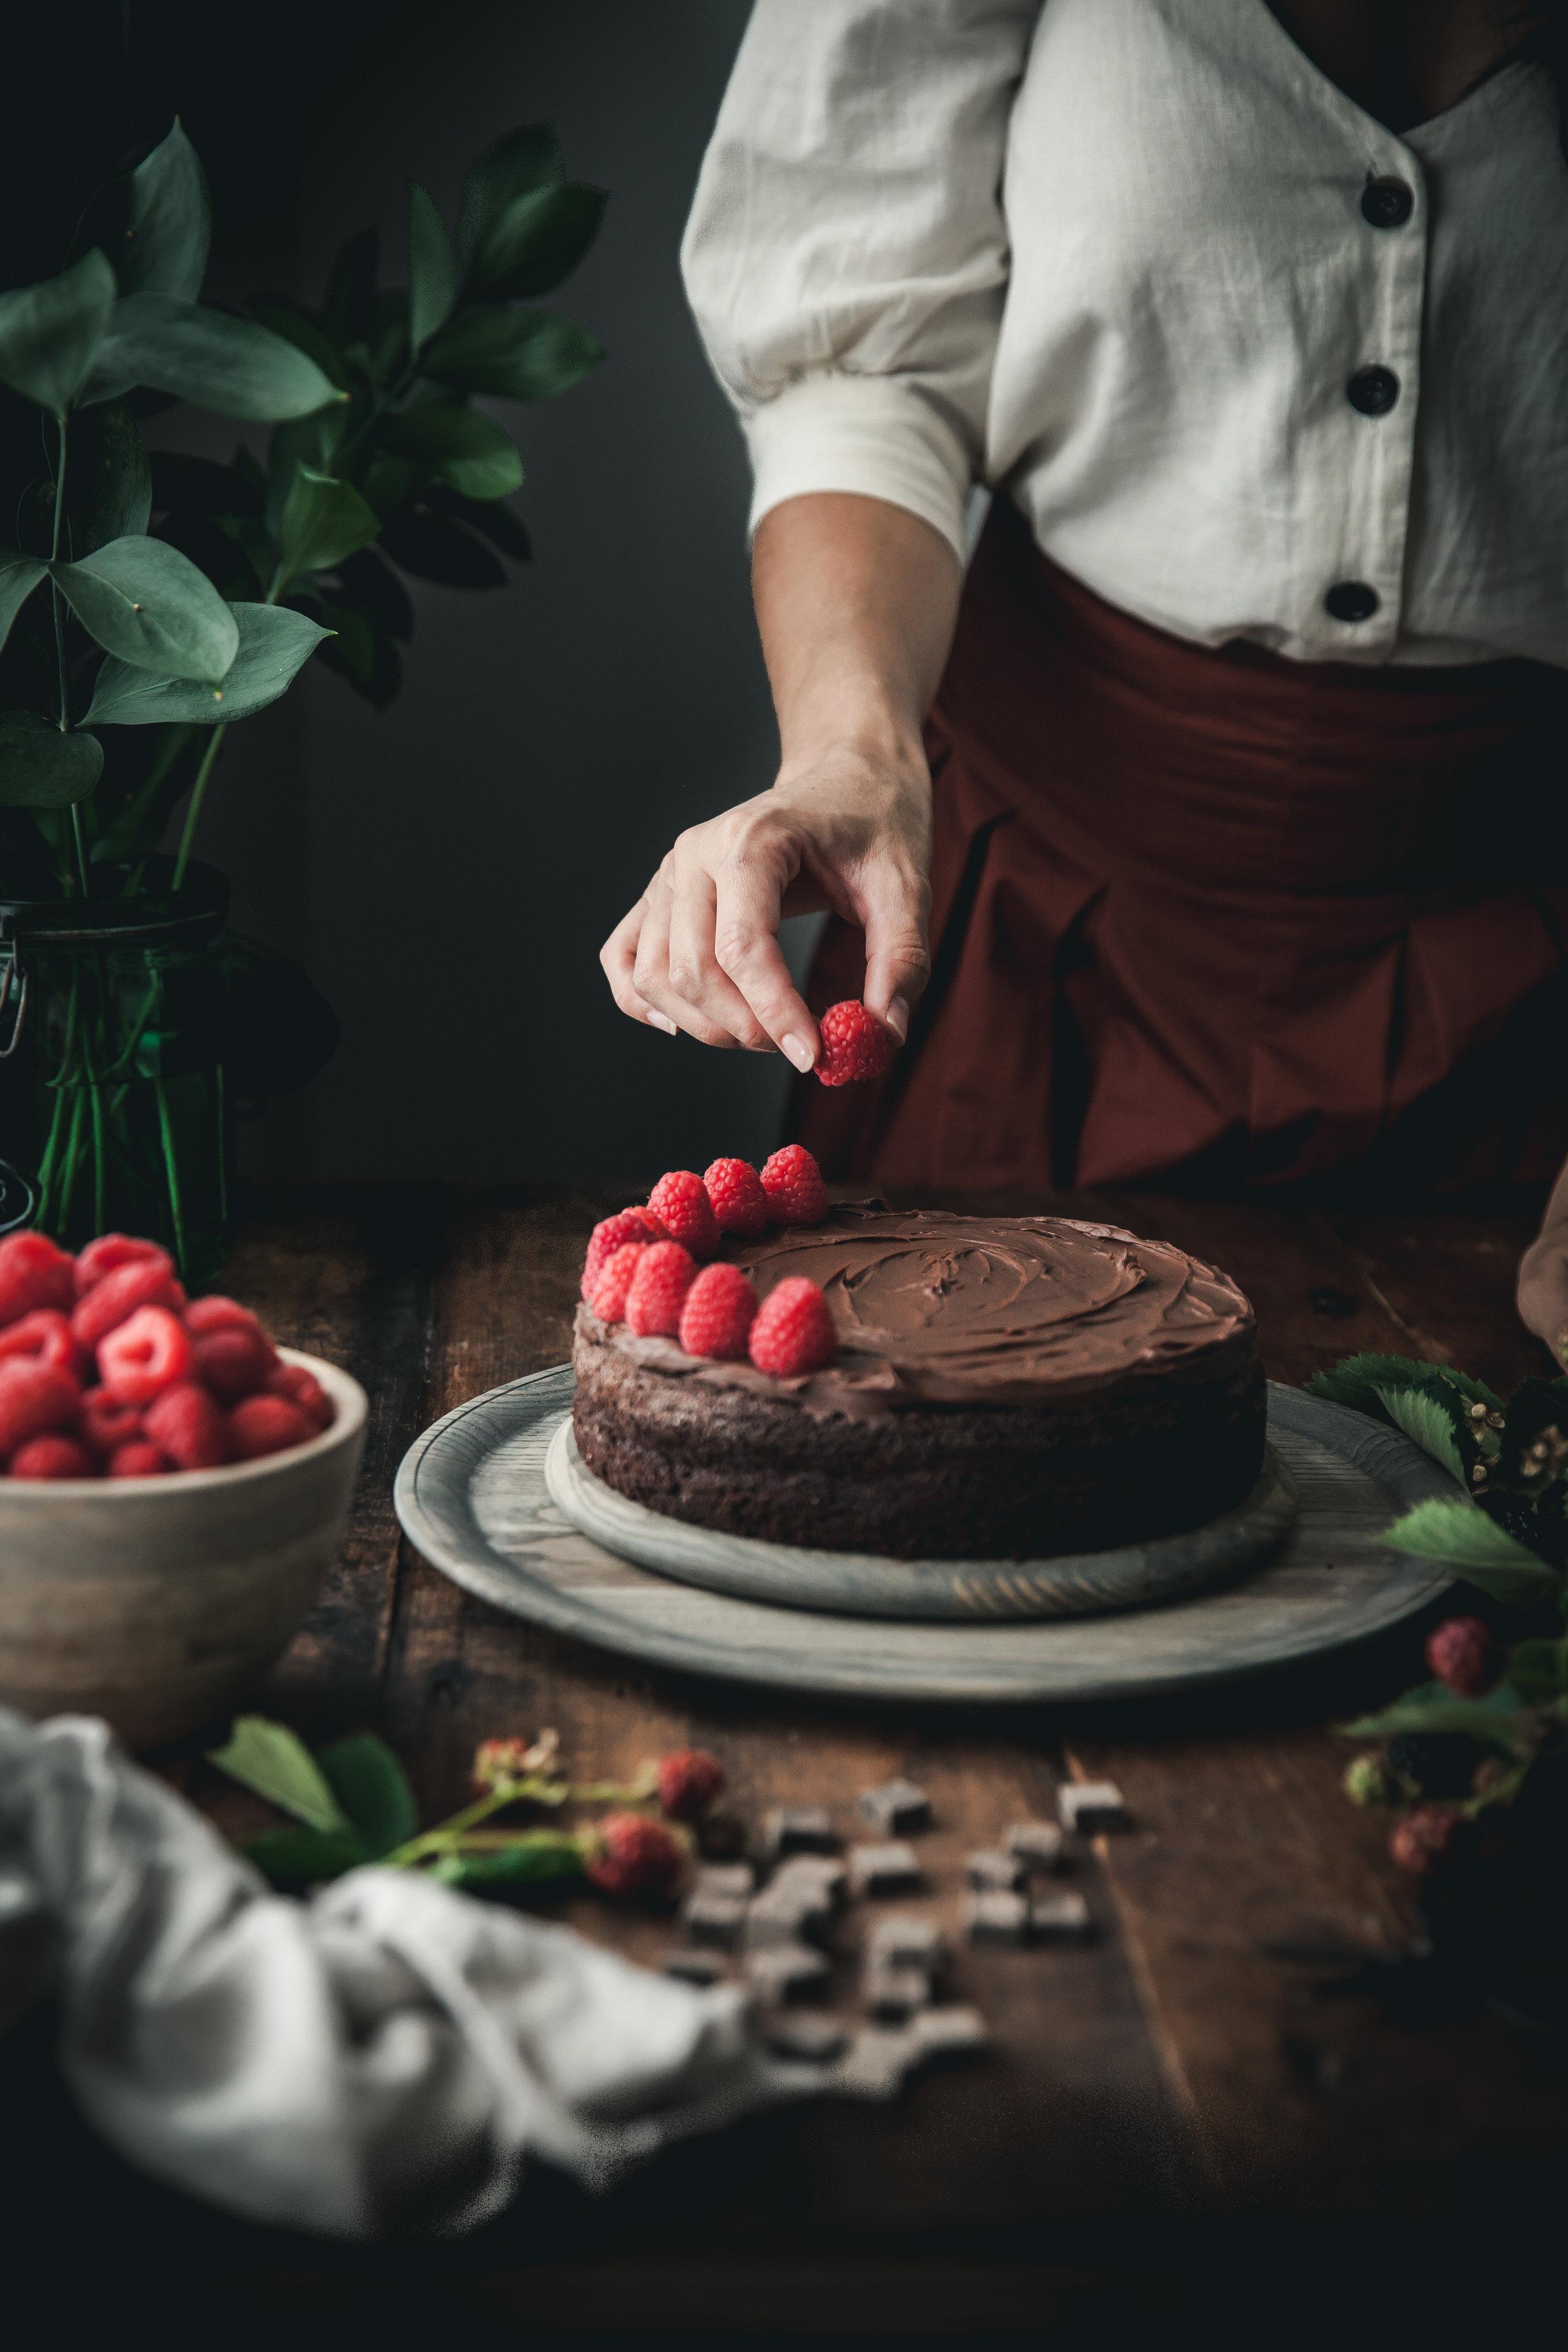 paleo chocolate raspberry cake 2 (1 of 1).jpg